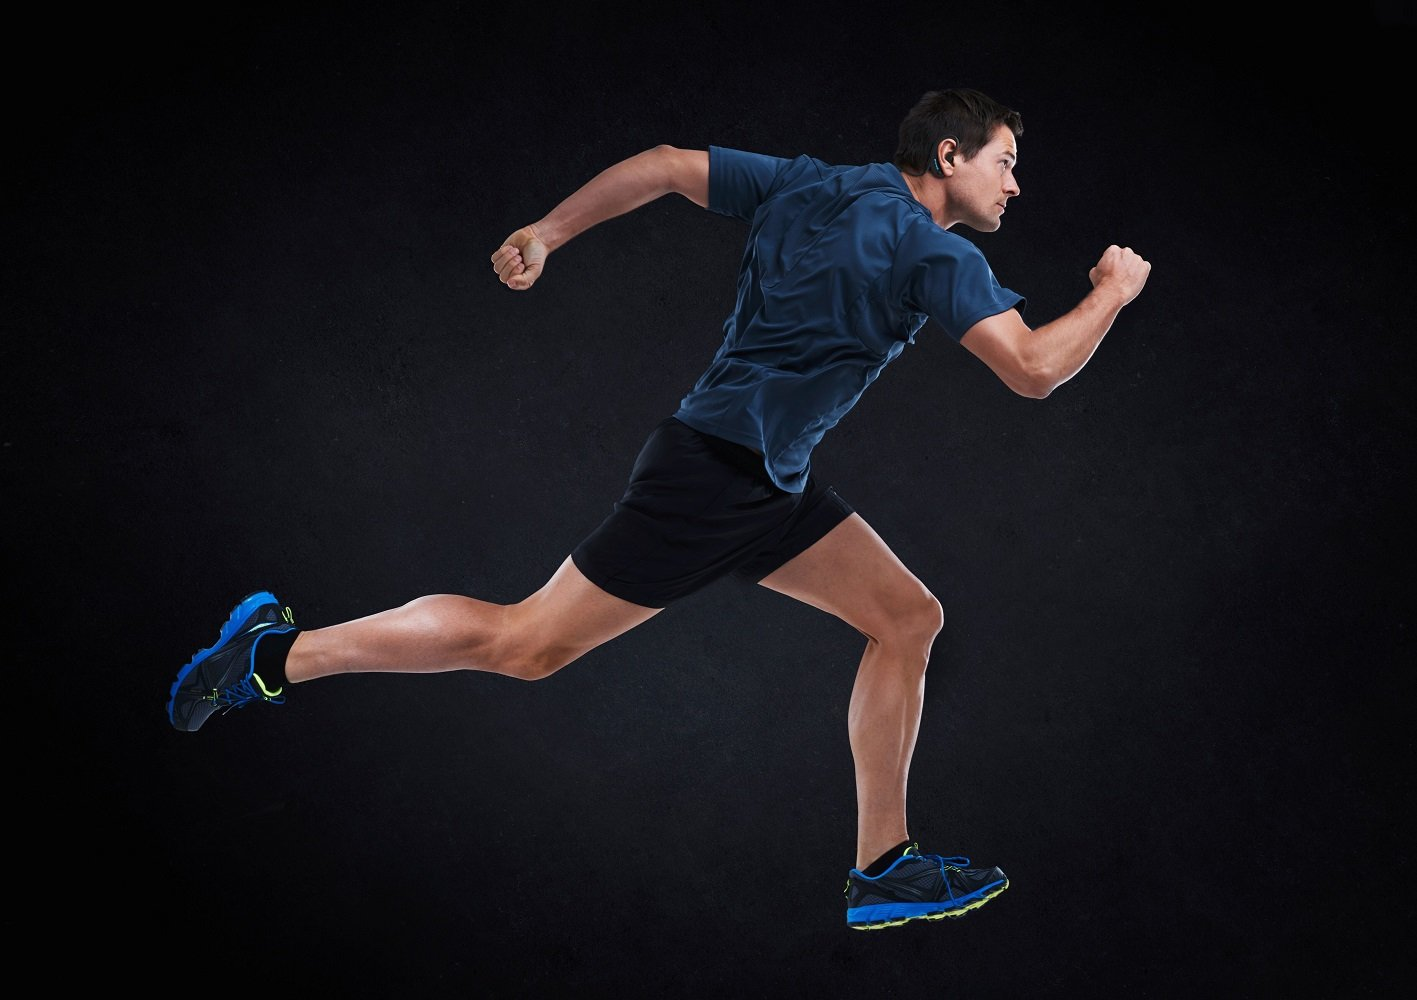 KuaiFit Sport Headphones - Heart Rate, Accelerometer, MP3, 8GB Memory, BLE, ANT+, Sweatproof, Audio Coach - Run Cycle Gym Triathlon by KuaiFit (Image #3)